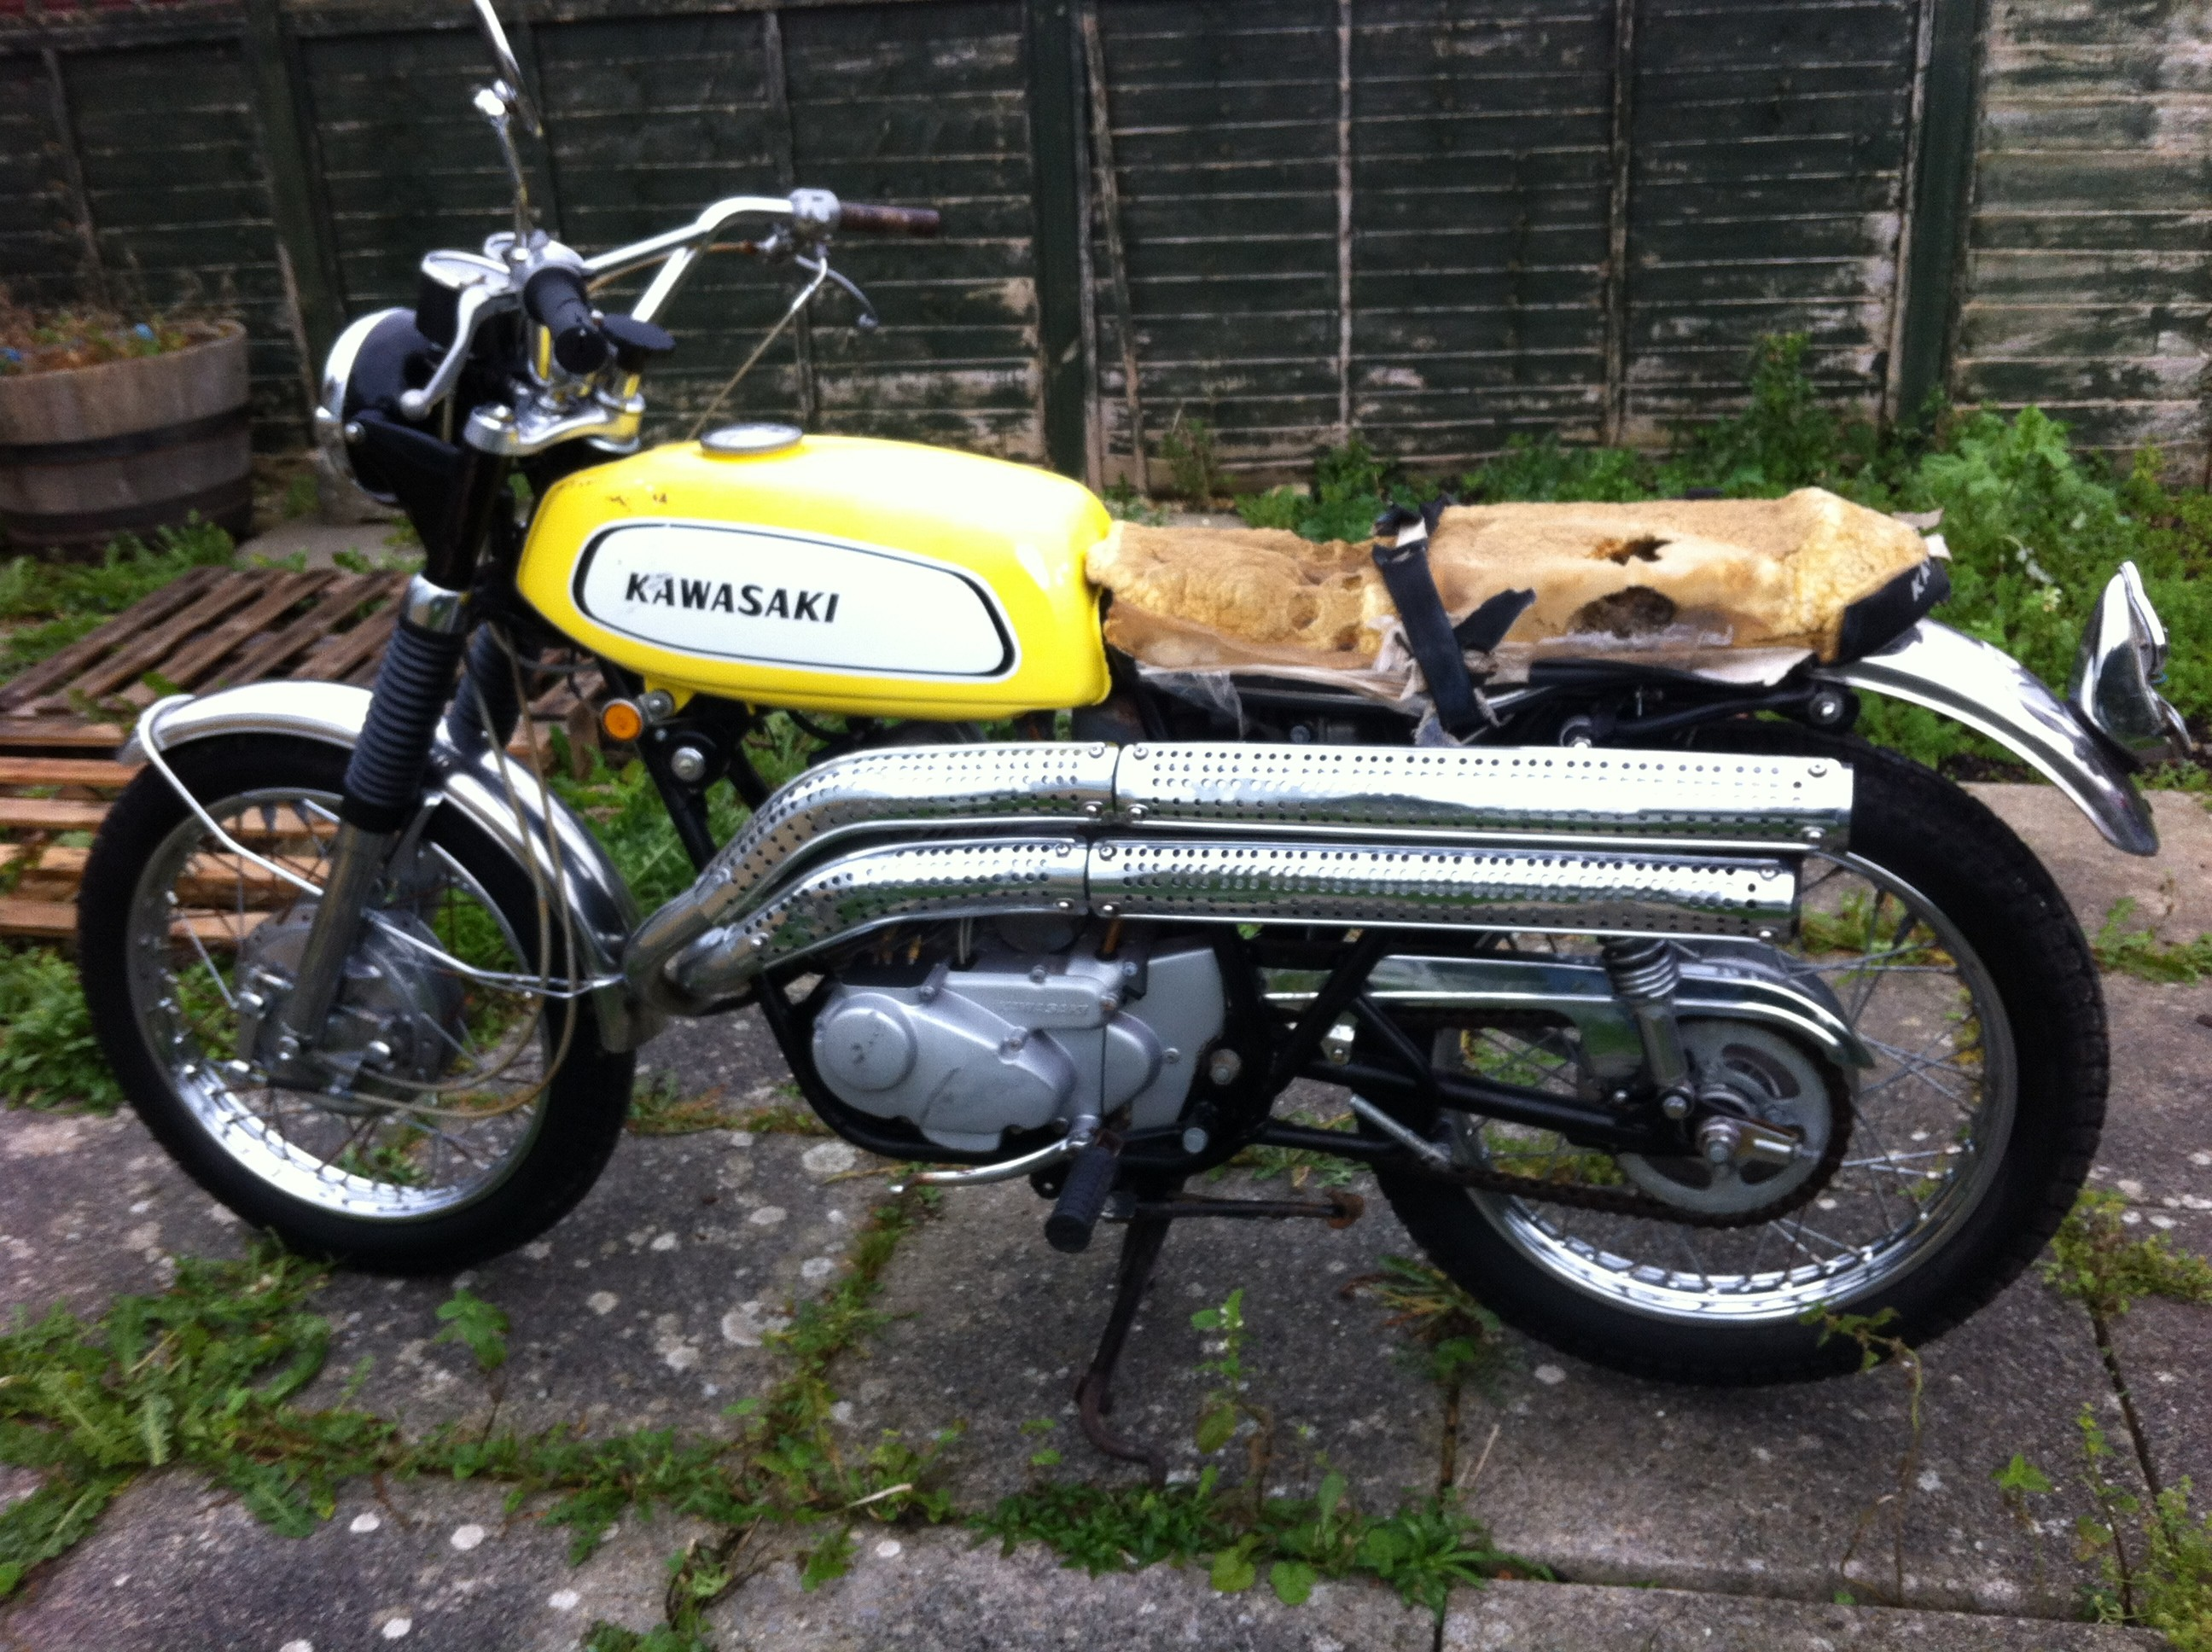 Kawasaki A1ss A 1970 From Rob